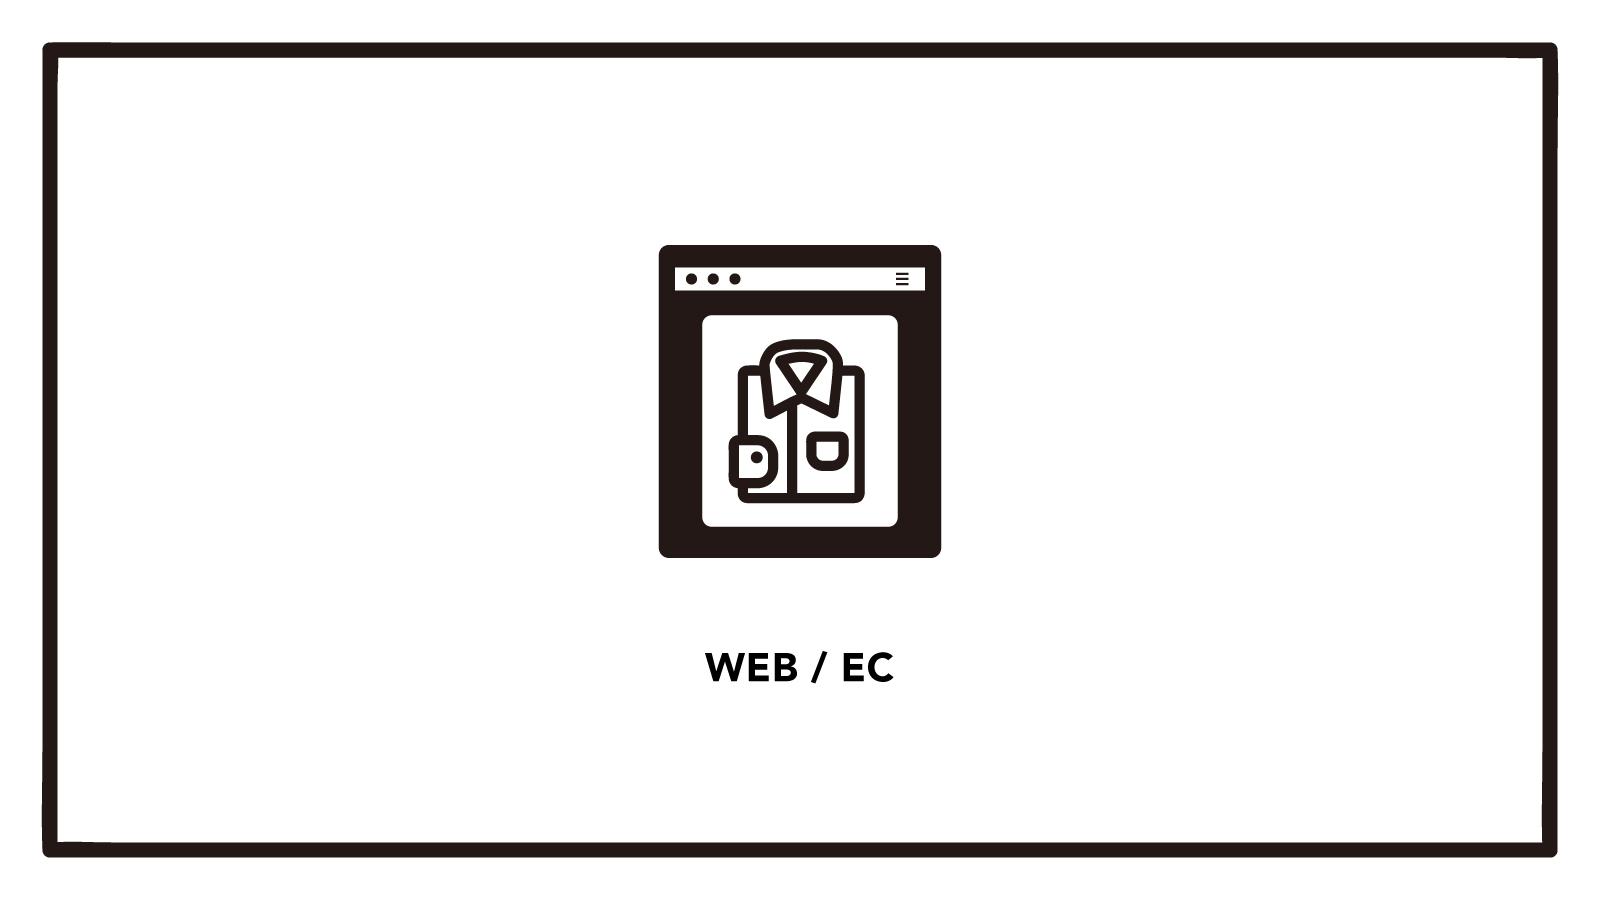 WEBディレクター|ファッション・アパレル業界最大級の自社ECサイトのカバー写真